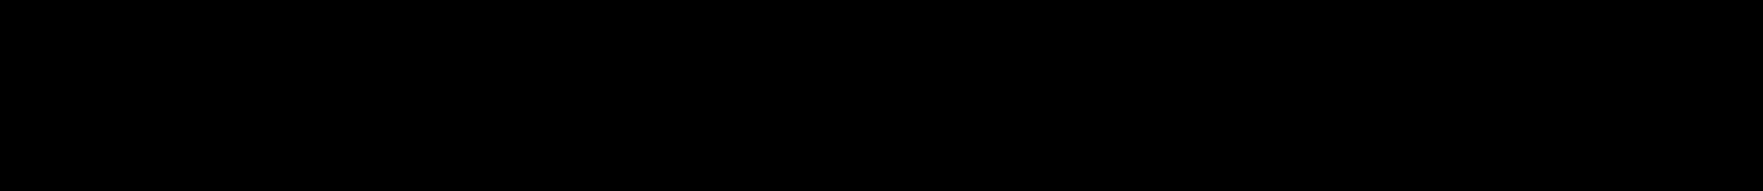 Doradani Light Italic